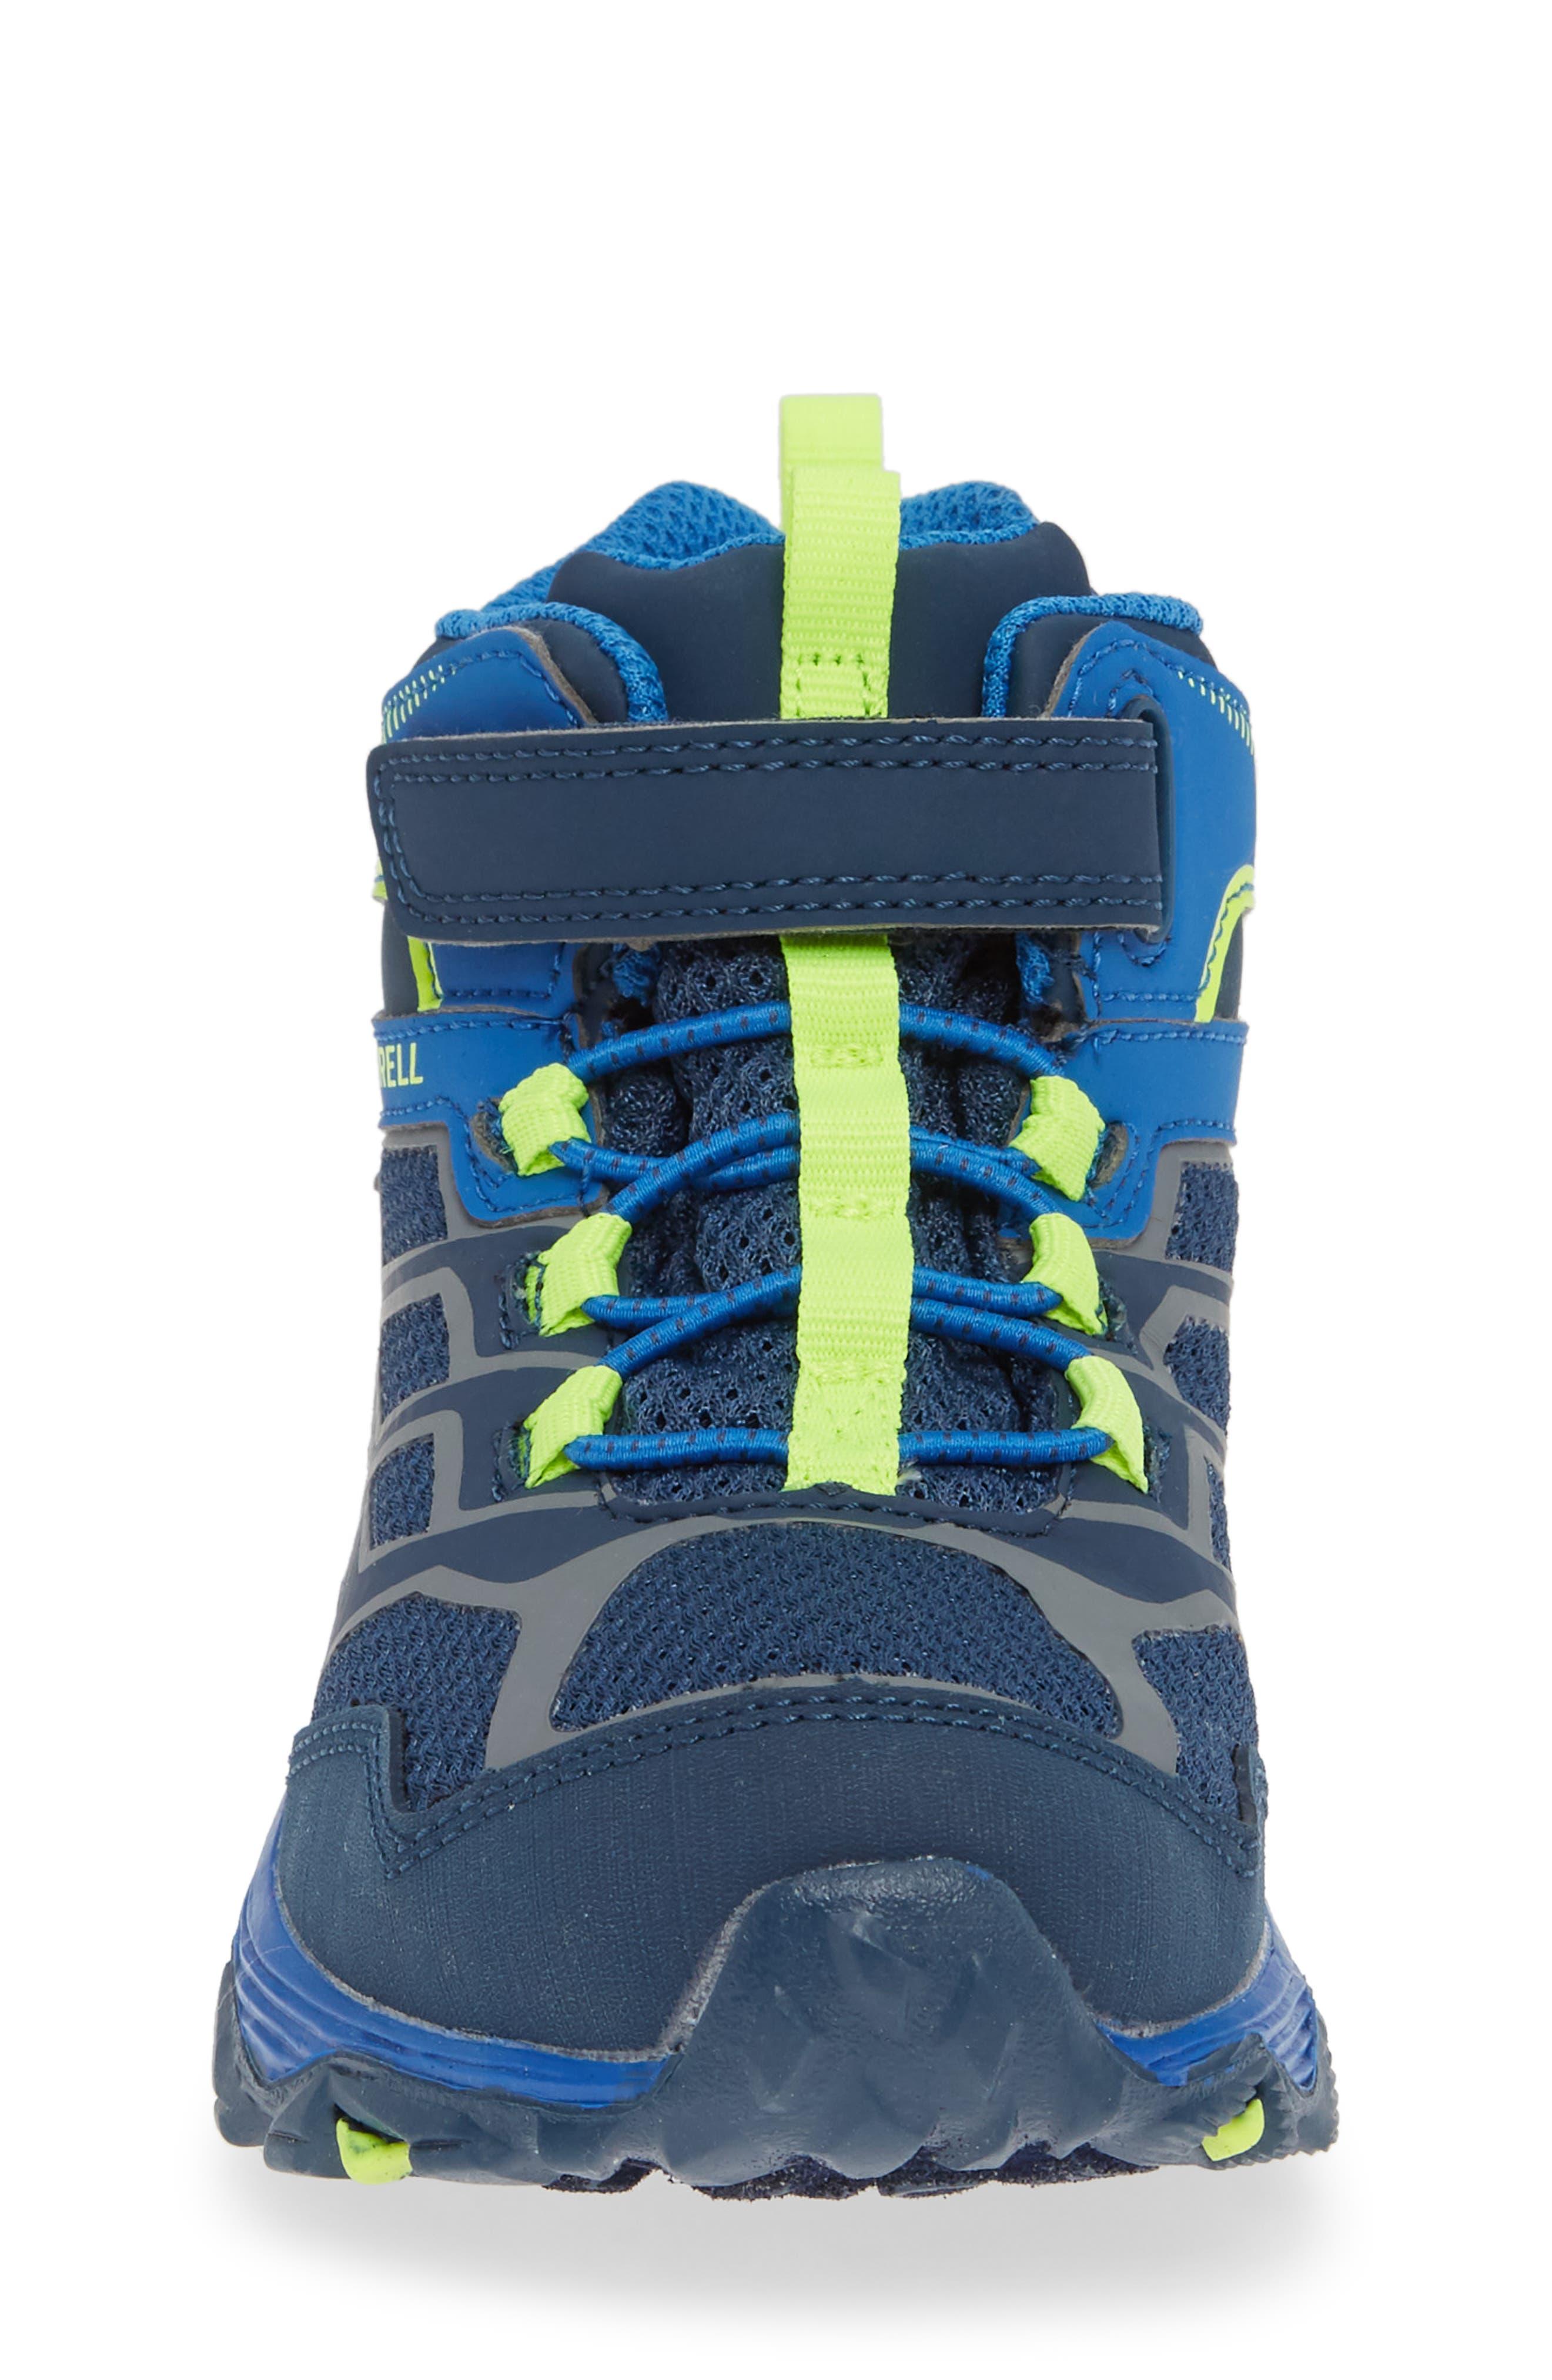 MERRELL, Moab FST Mid Top Waterproof Sneaker Boot, Alternate thumbnail 4, color, NAVY/ COBALT